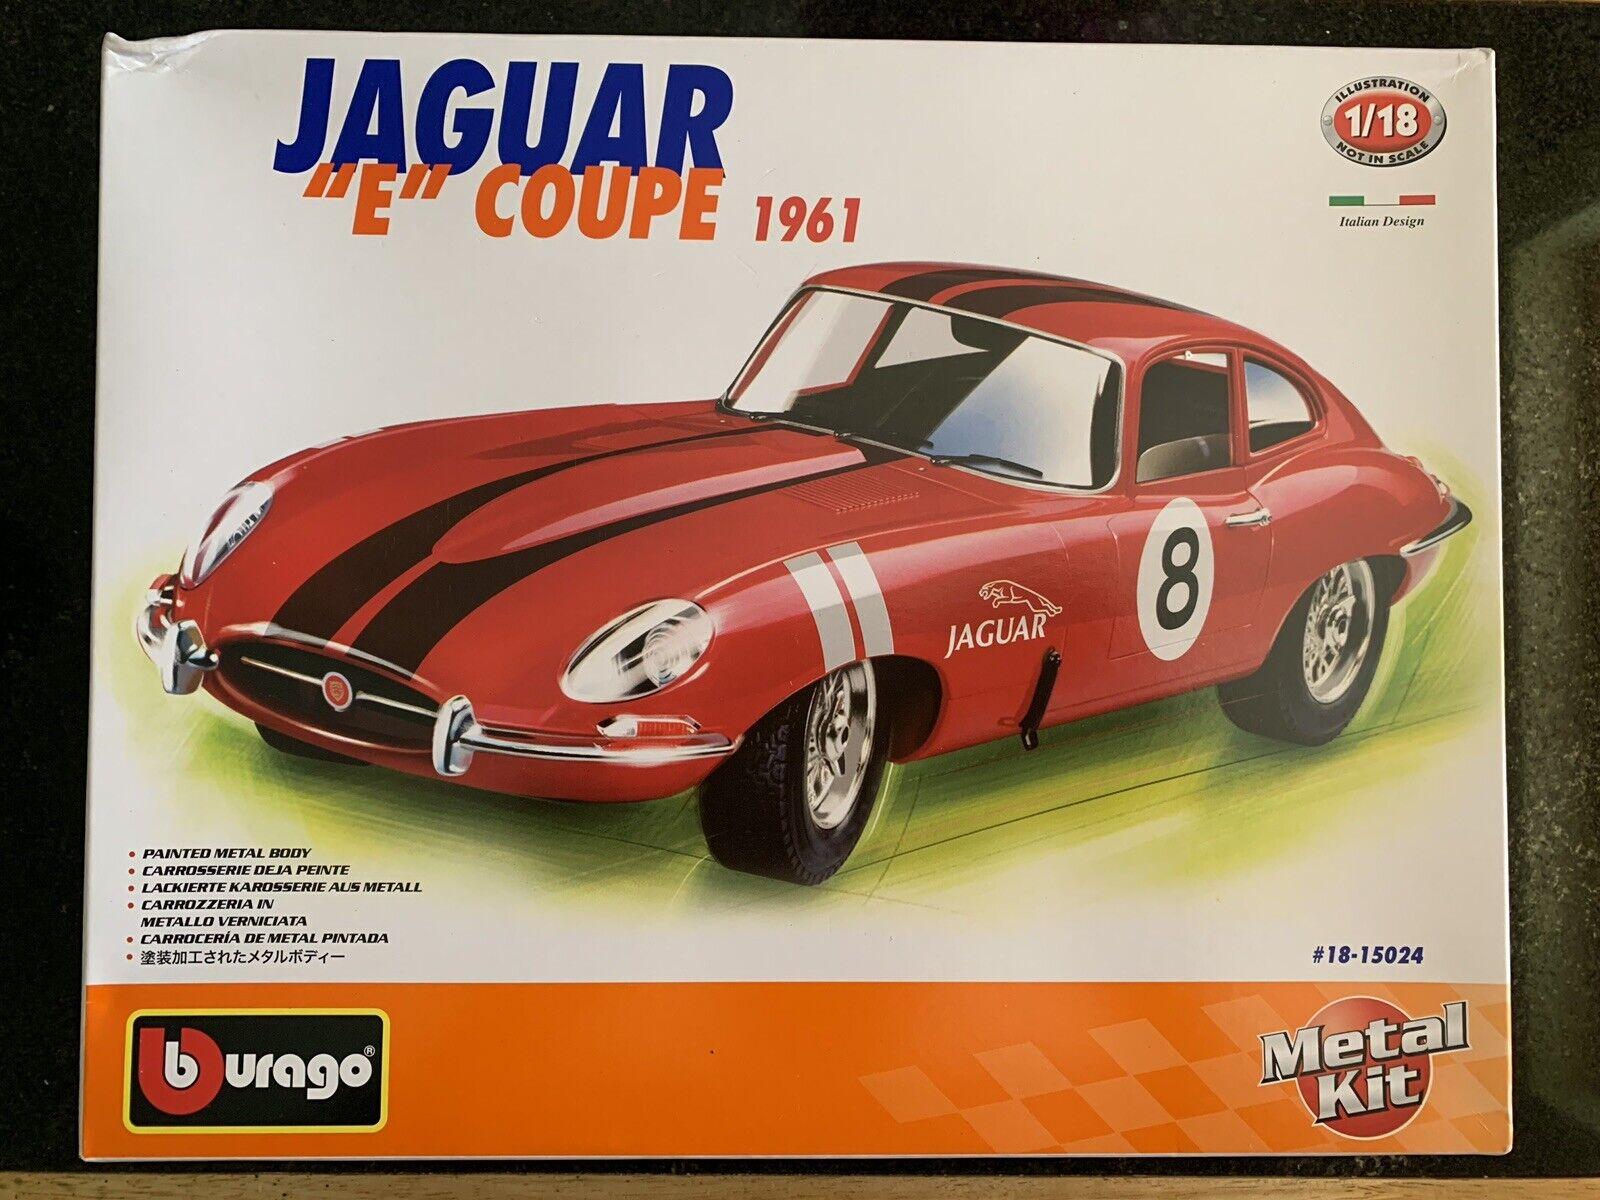 1 18 Jaguar E Type Coupe rot Race Car No8 1 18 Diecast Classic Car Kit (New)